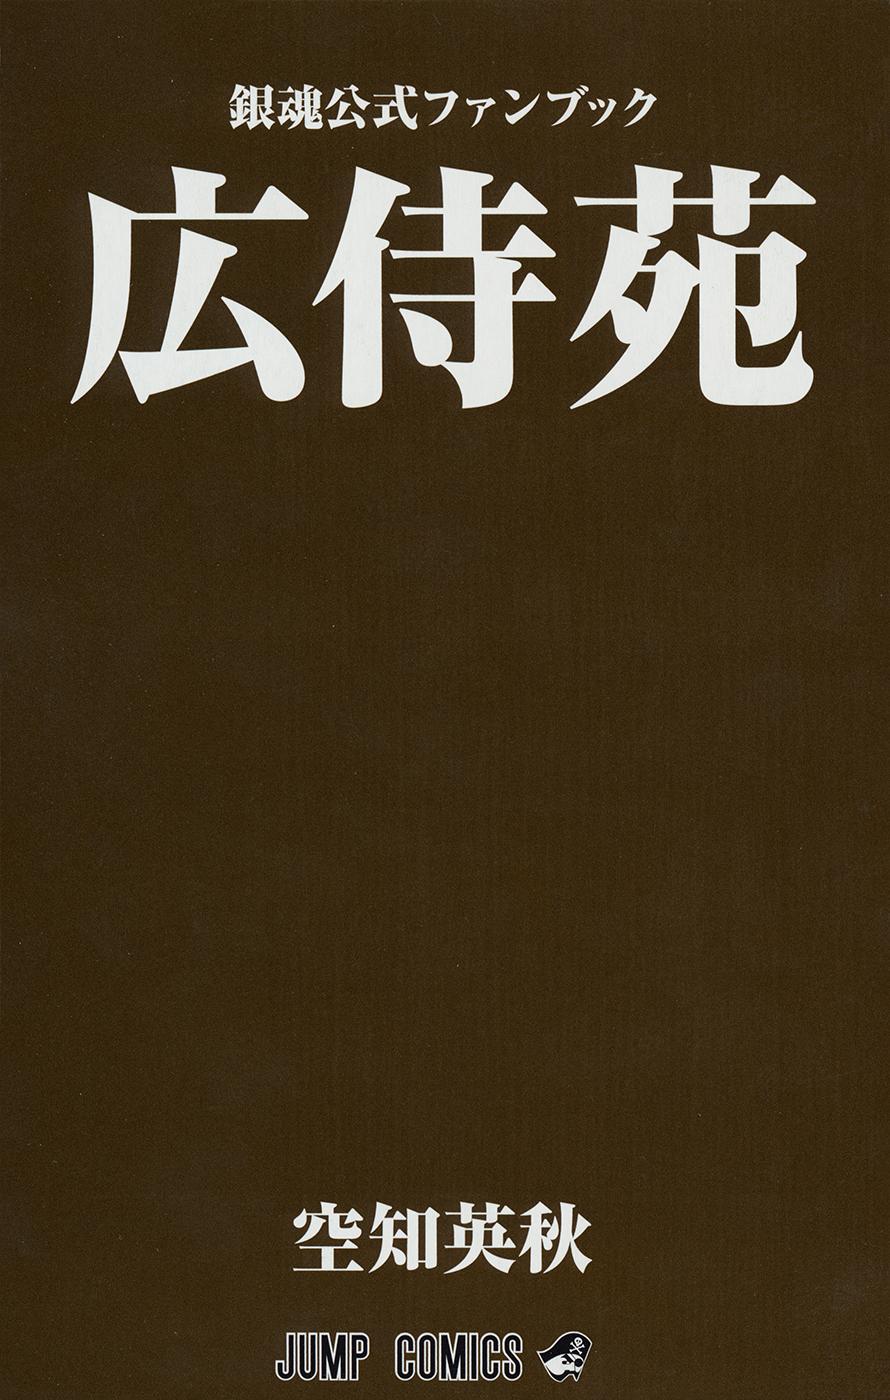 Gintama, Gintama manga, gintama anime, Silver Soul, Silver Soul manga, Silver Soul anime, manga